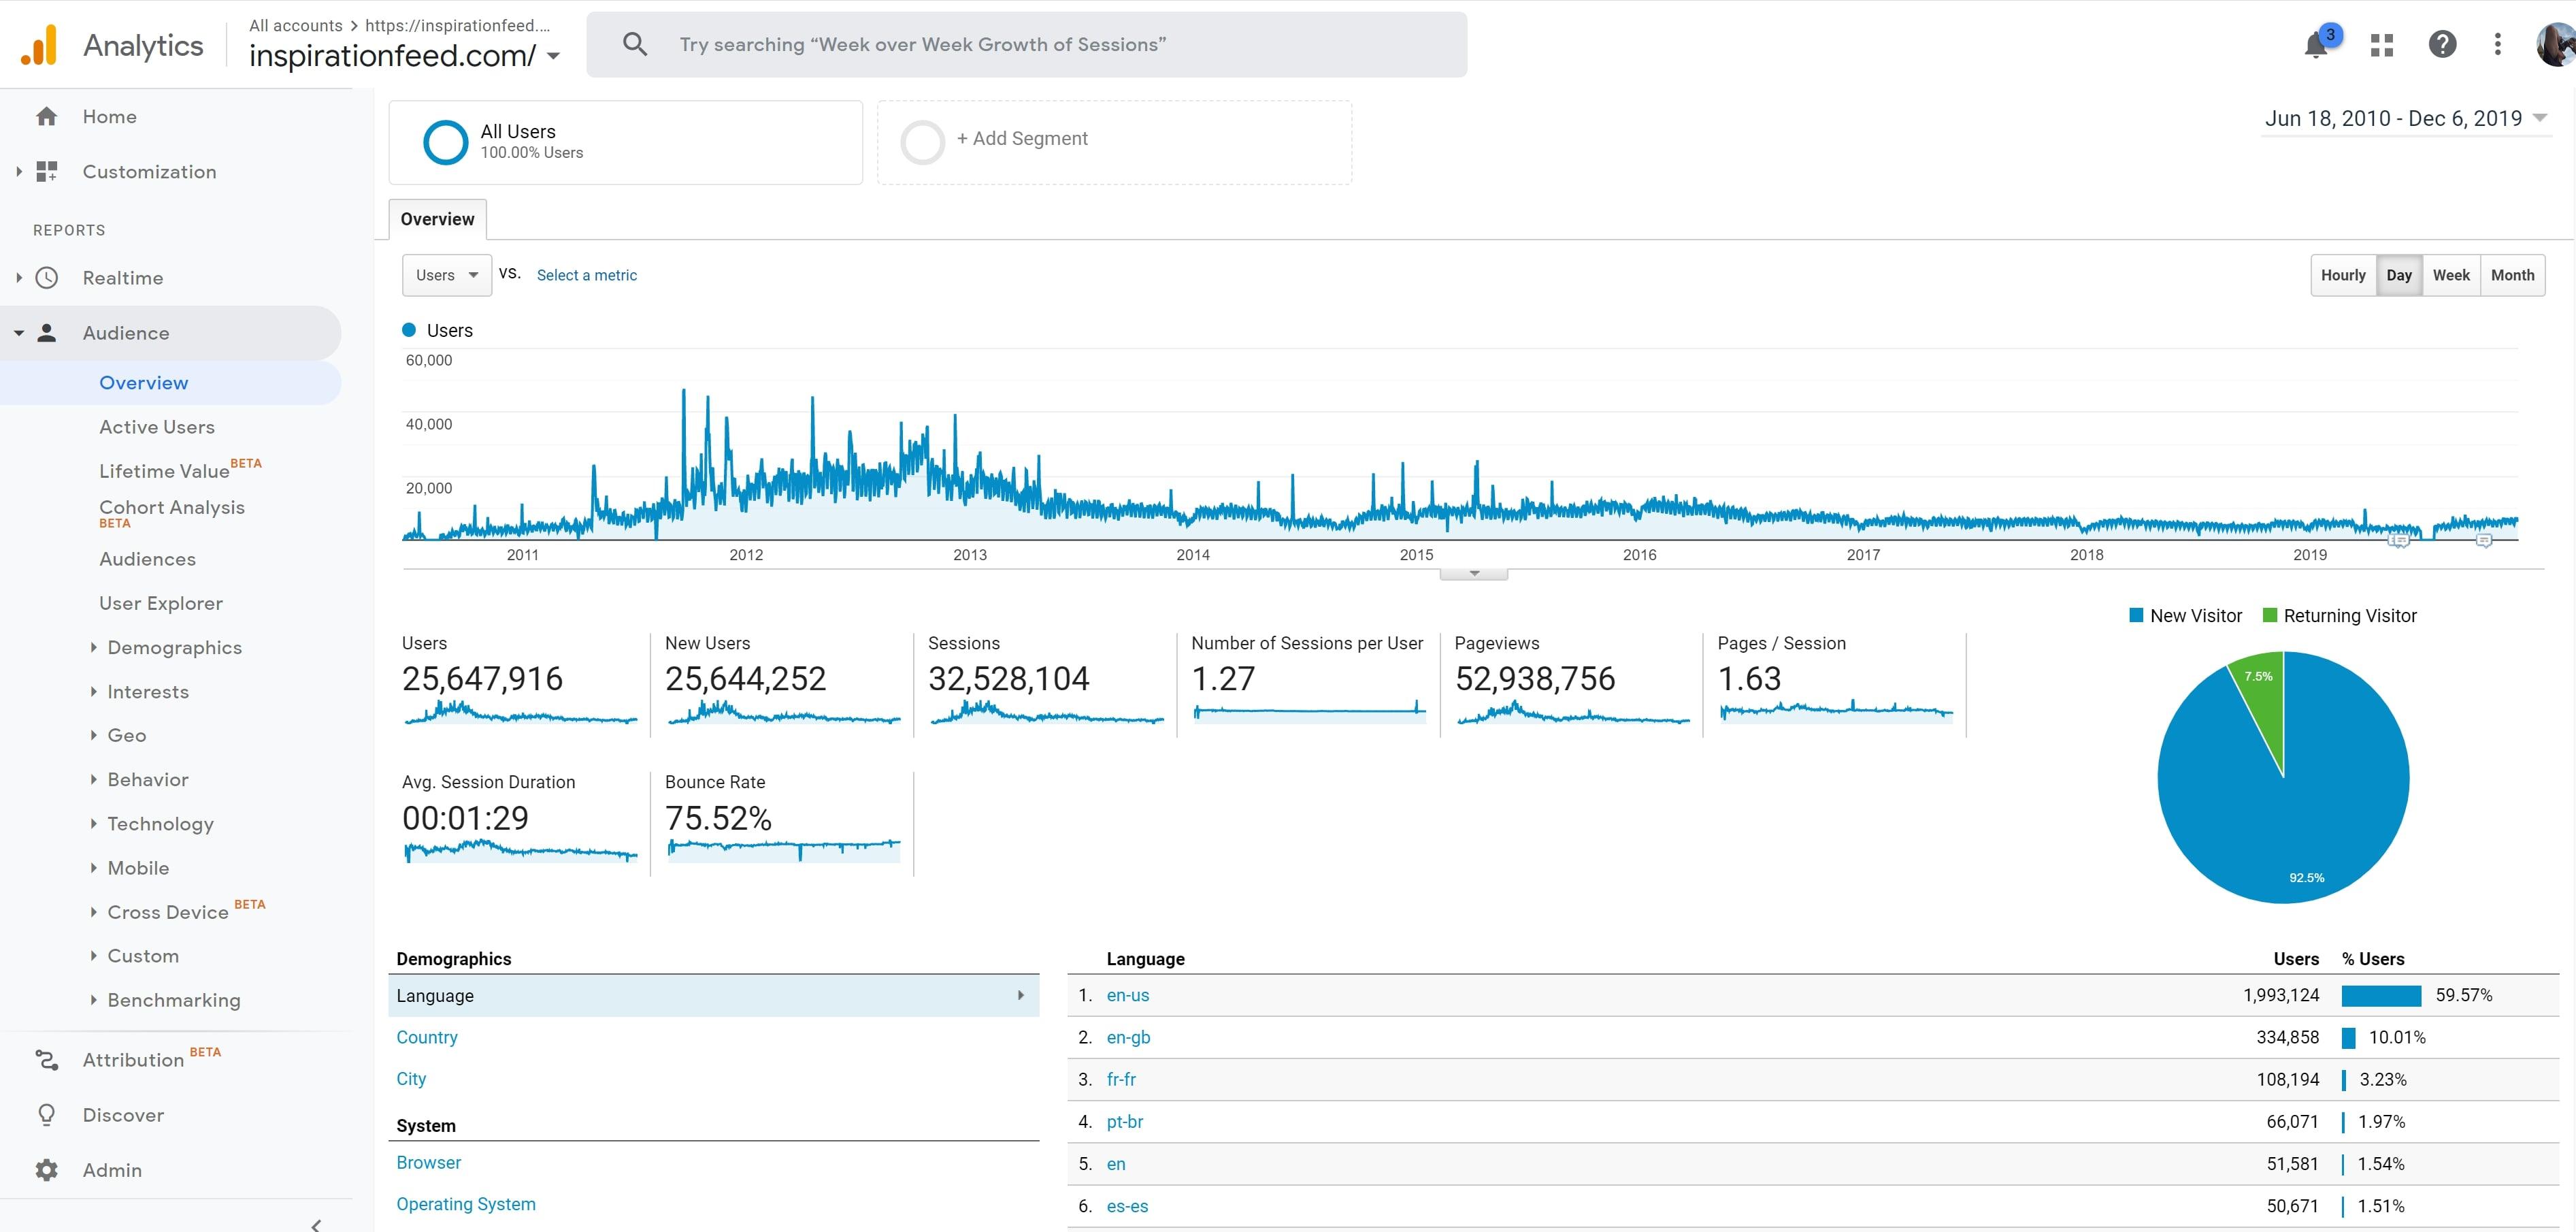 Google Analytics From 2010-2019